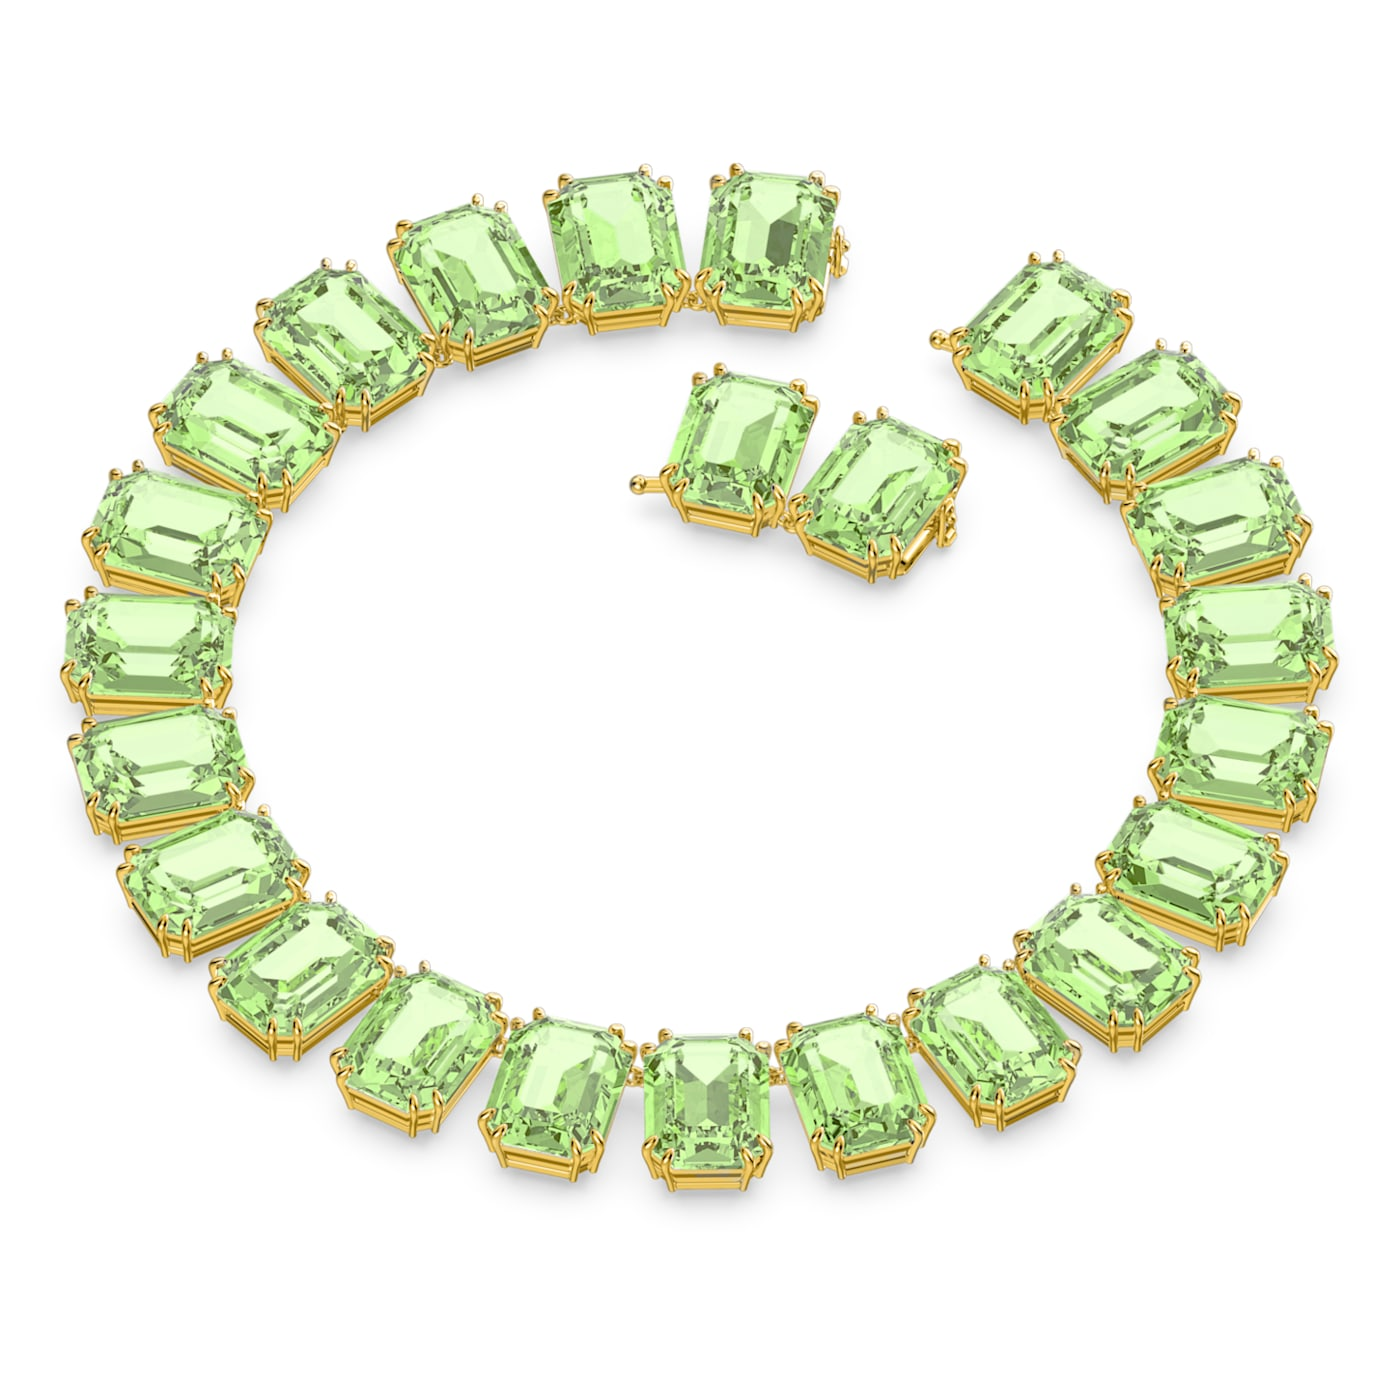 Collier Millenia Cristaux octogonaux, Vert, Métal doré, Swarovski